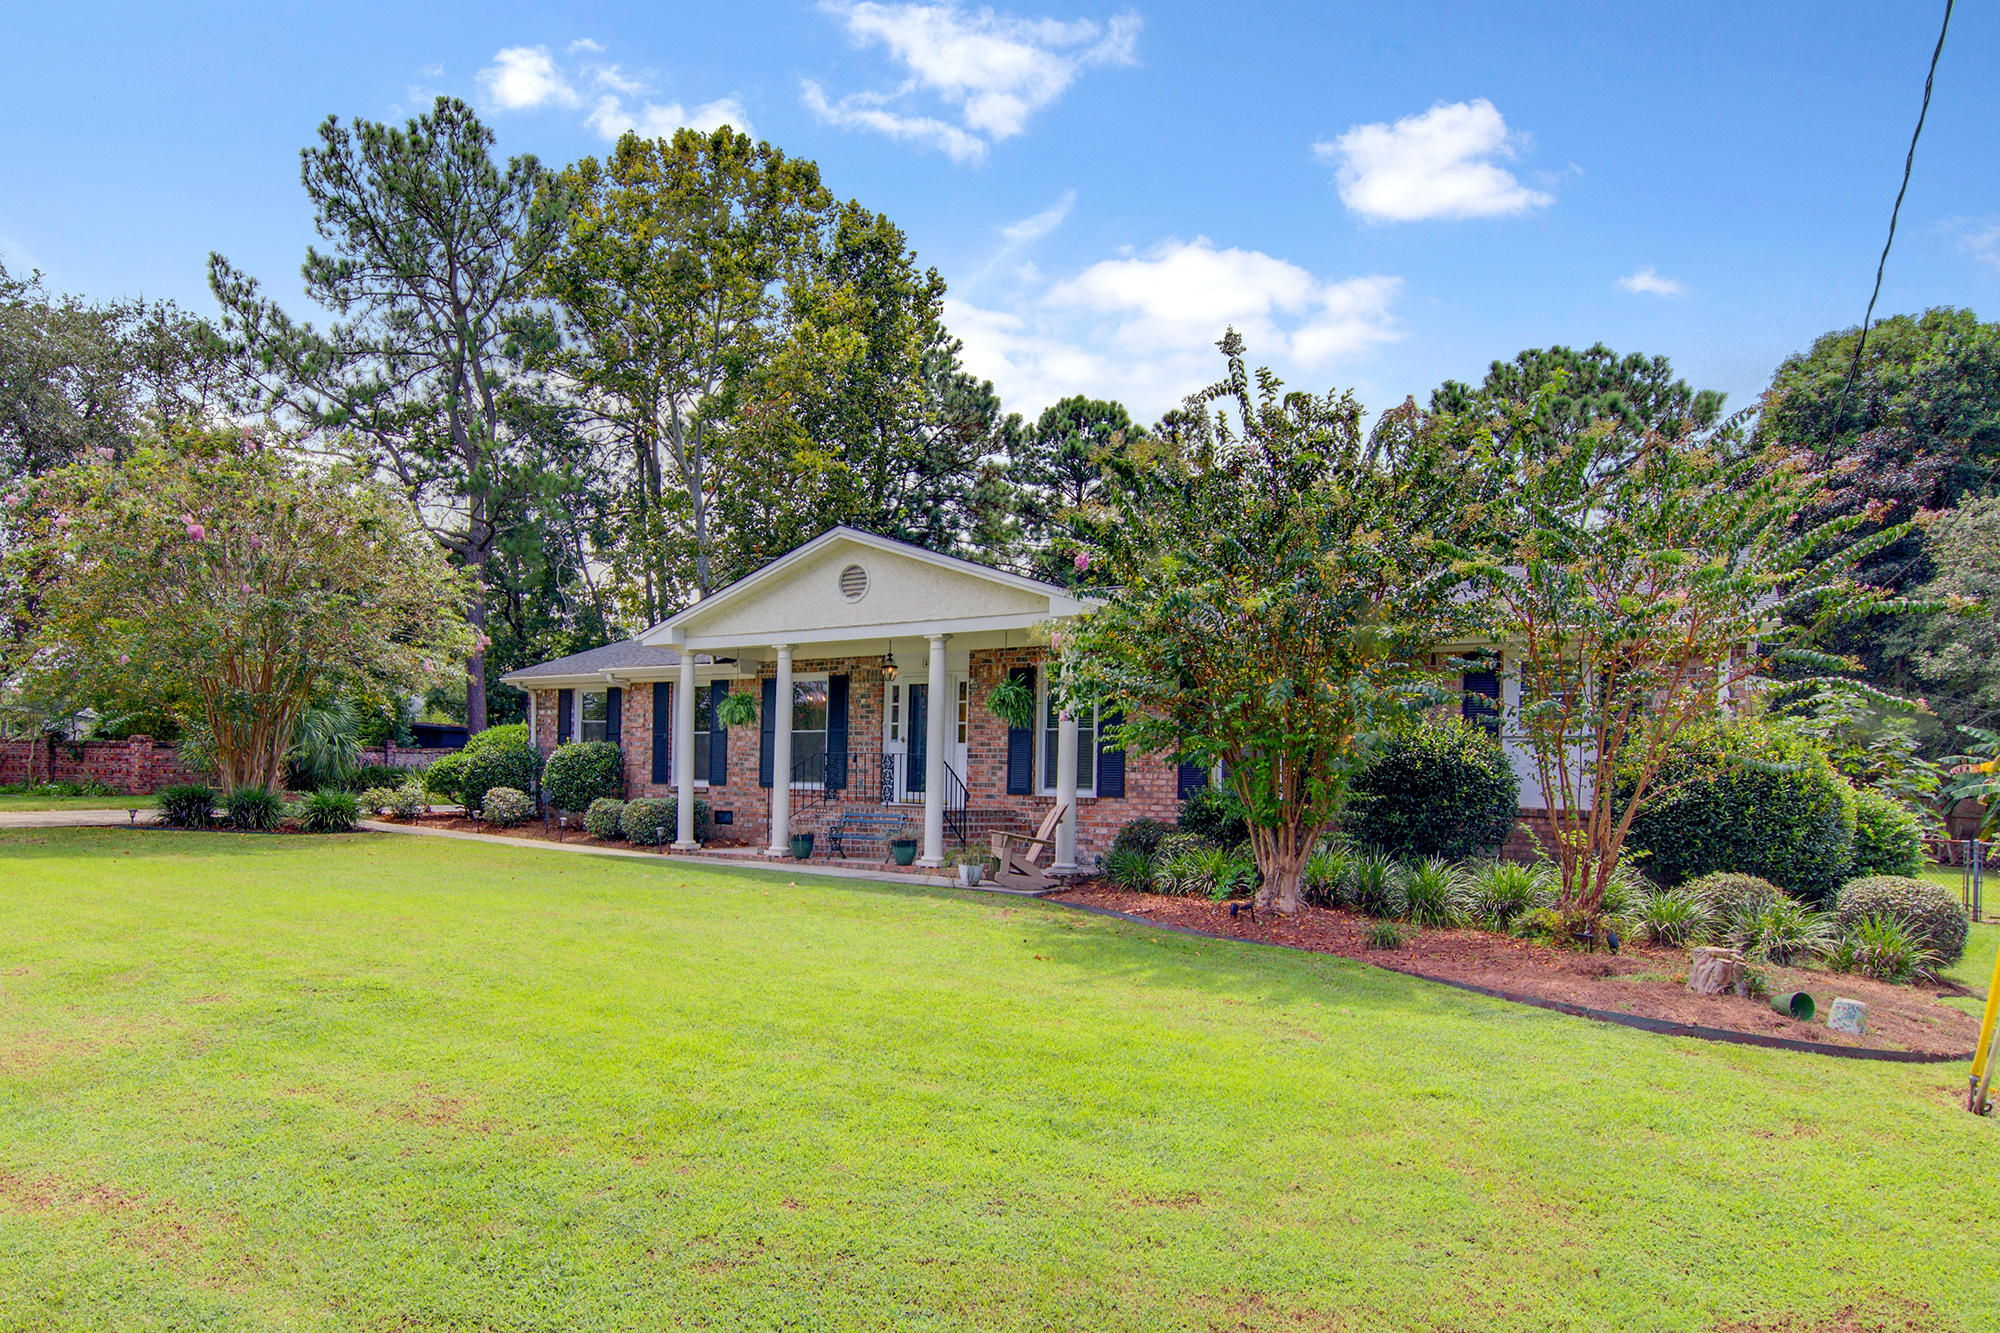 Photo of 45 Norview Dr, Charleston, SC 29407